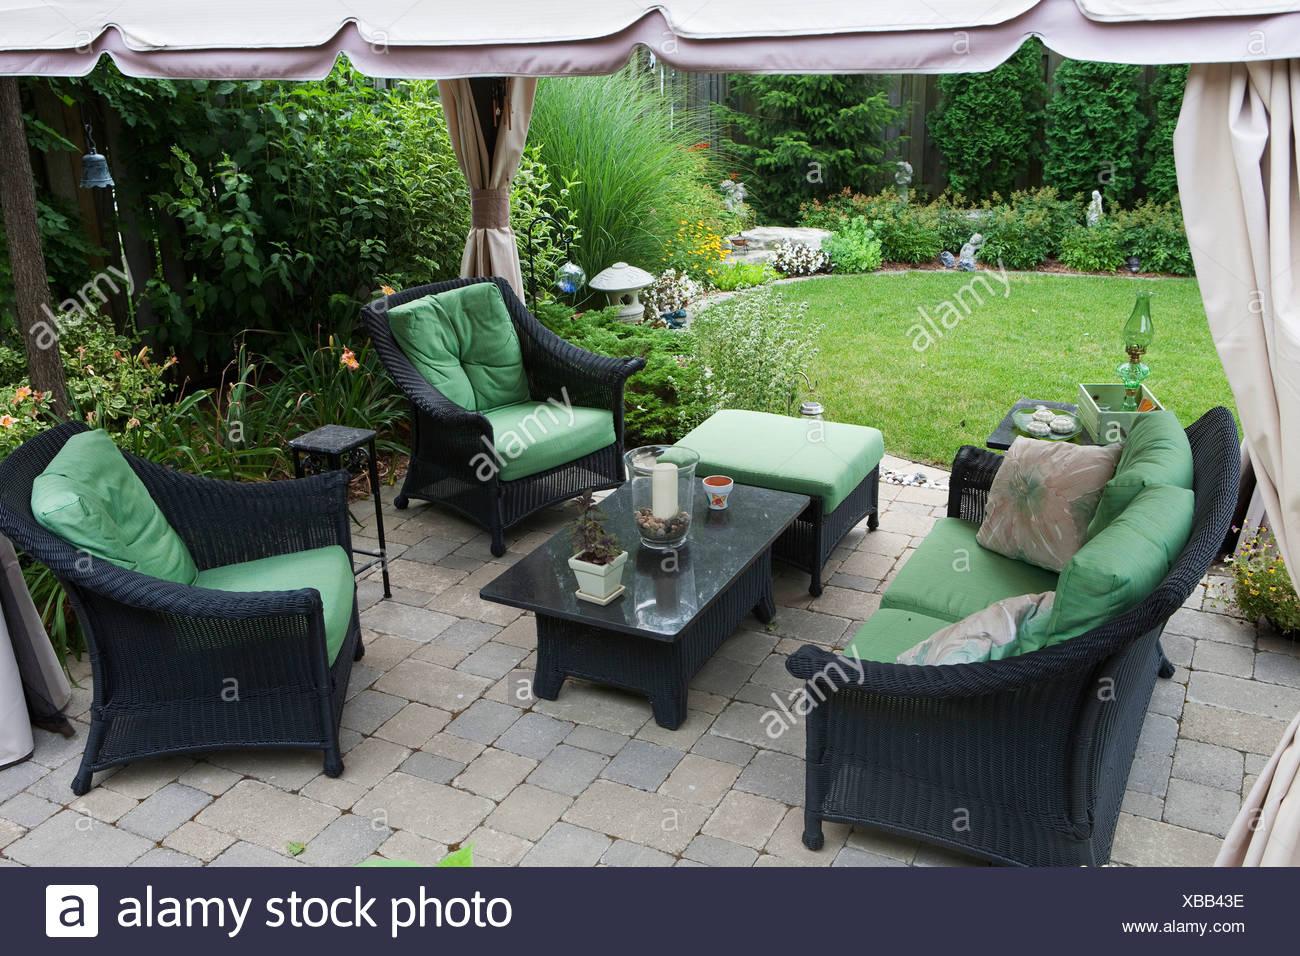 https www alamy com covered patio furniture on stone patio in a backyard burlington ontario canada image282371810 html